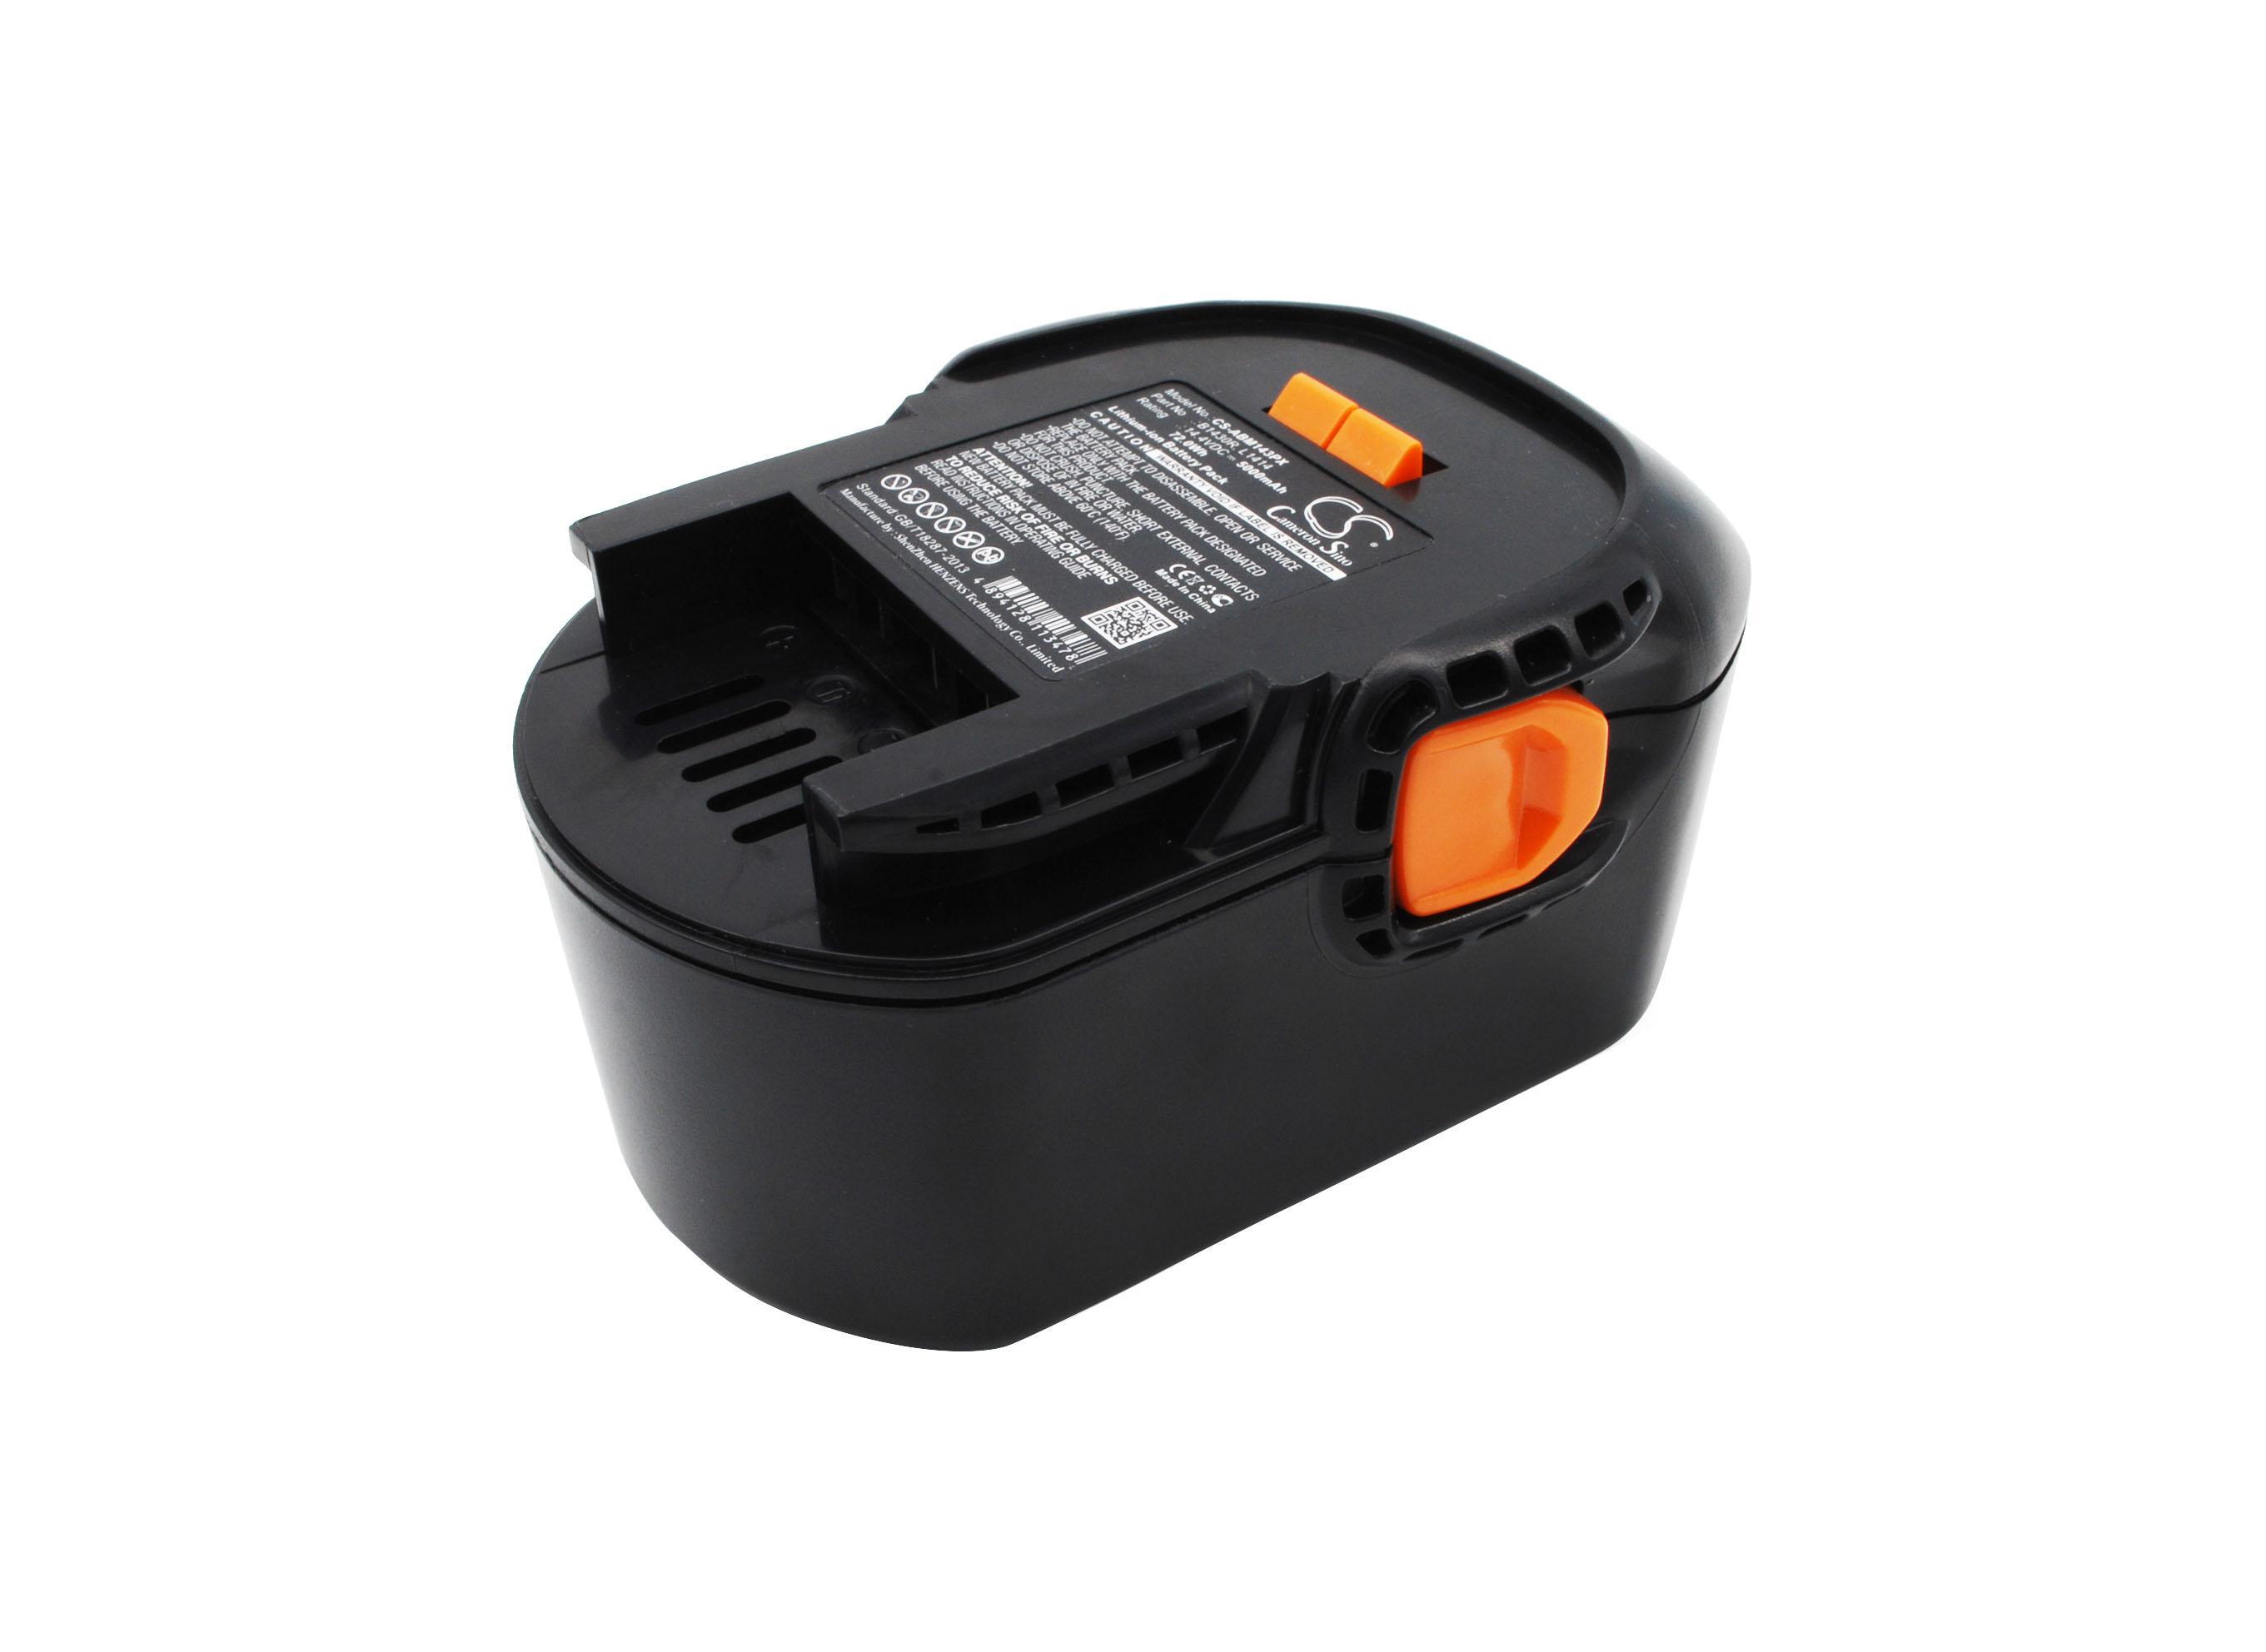 Cameron Sino baterie do nářadí pro AEG FL 14 14.4V Li-ion 5000mAh černá - neoriginální